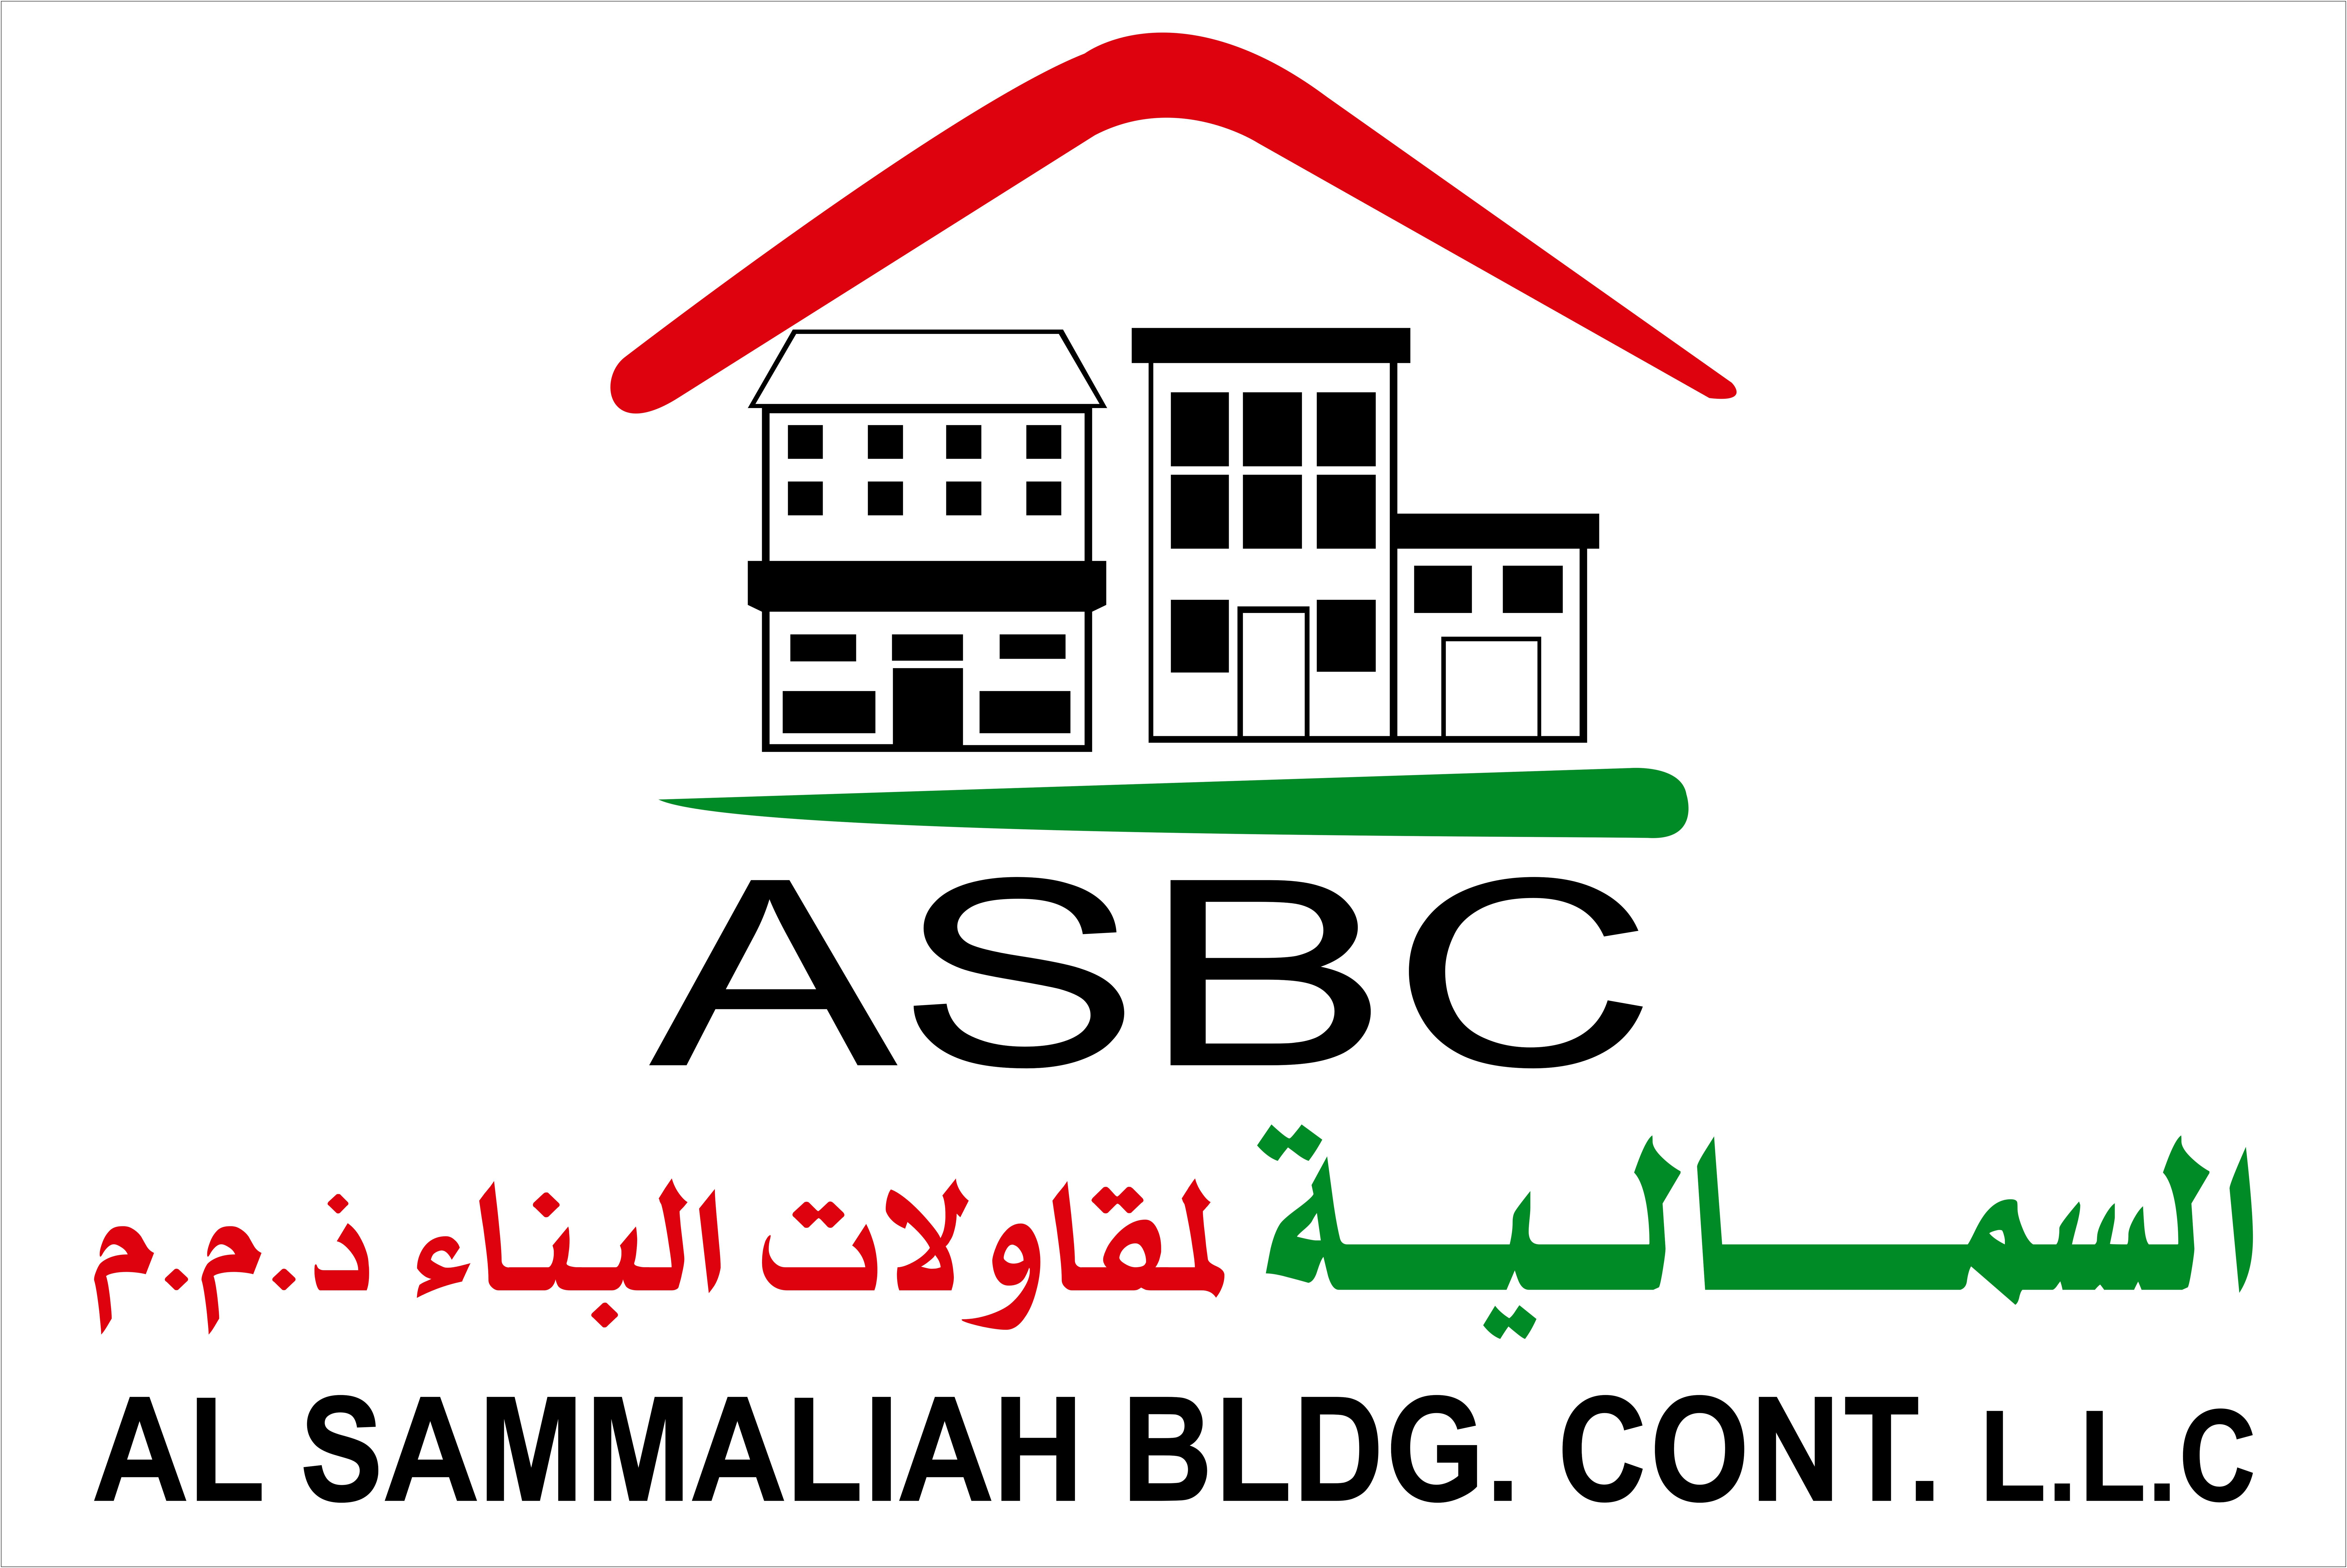 Construction Jobs in Sharjah, UAE | Dubizzle Sharjah